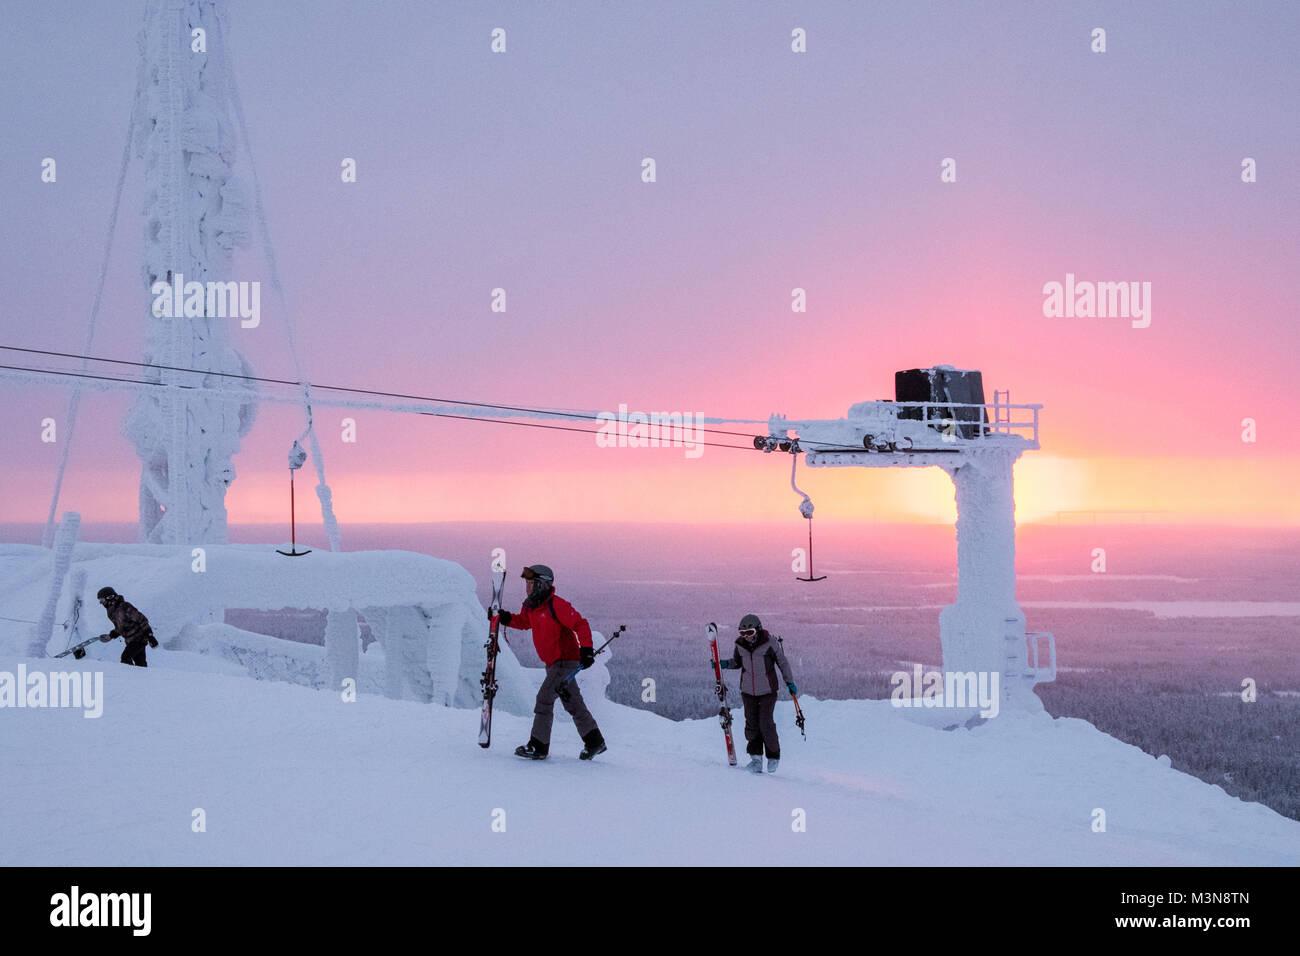 Das Skigebiet Ruka in Finnland Stockbild